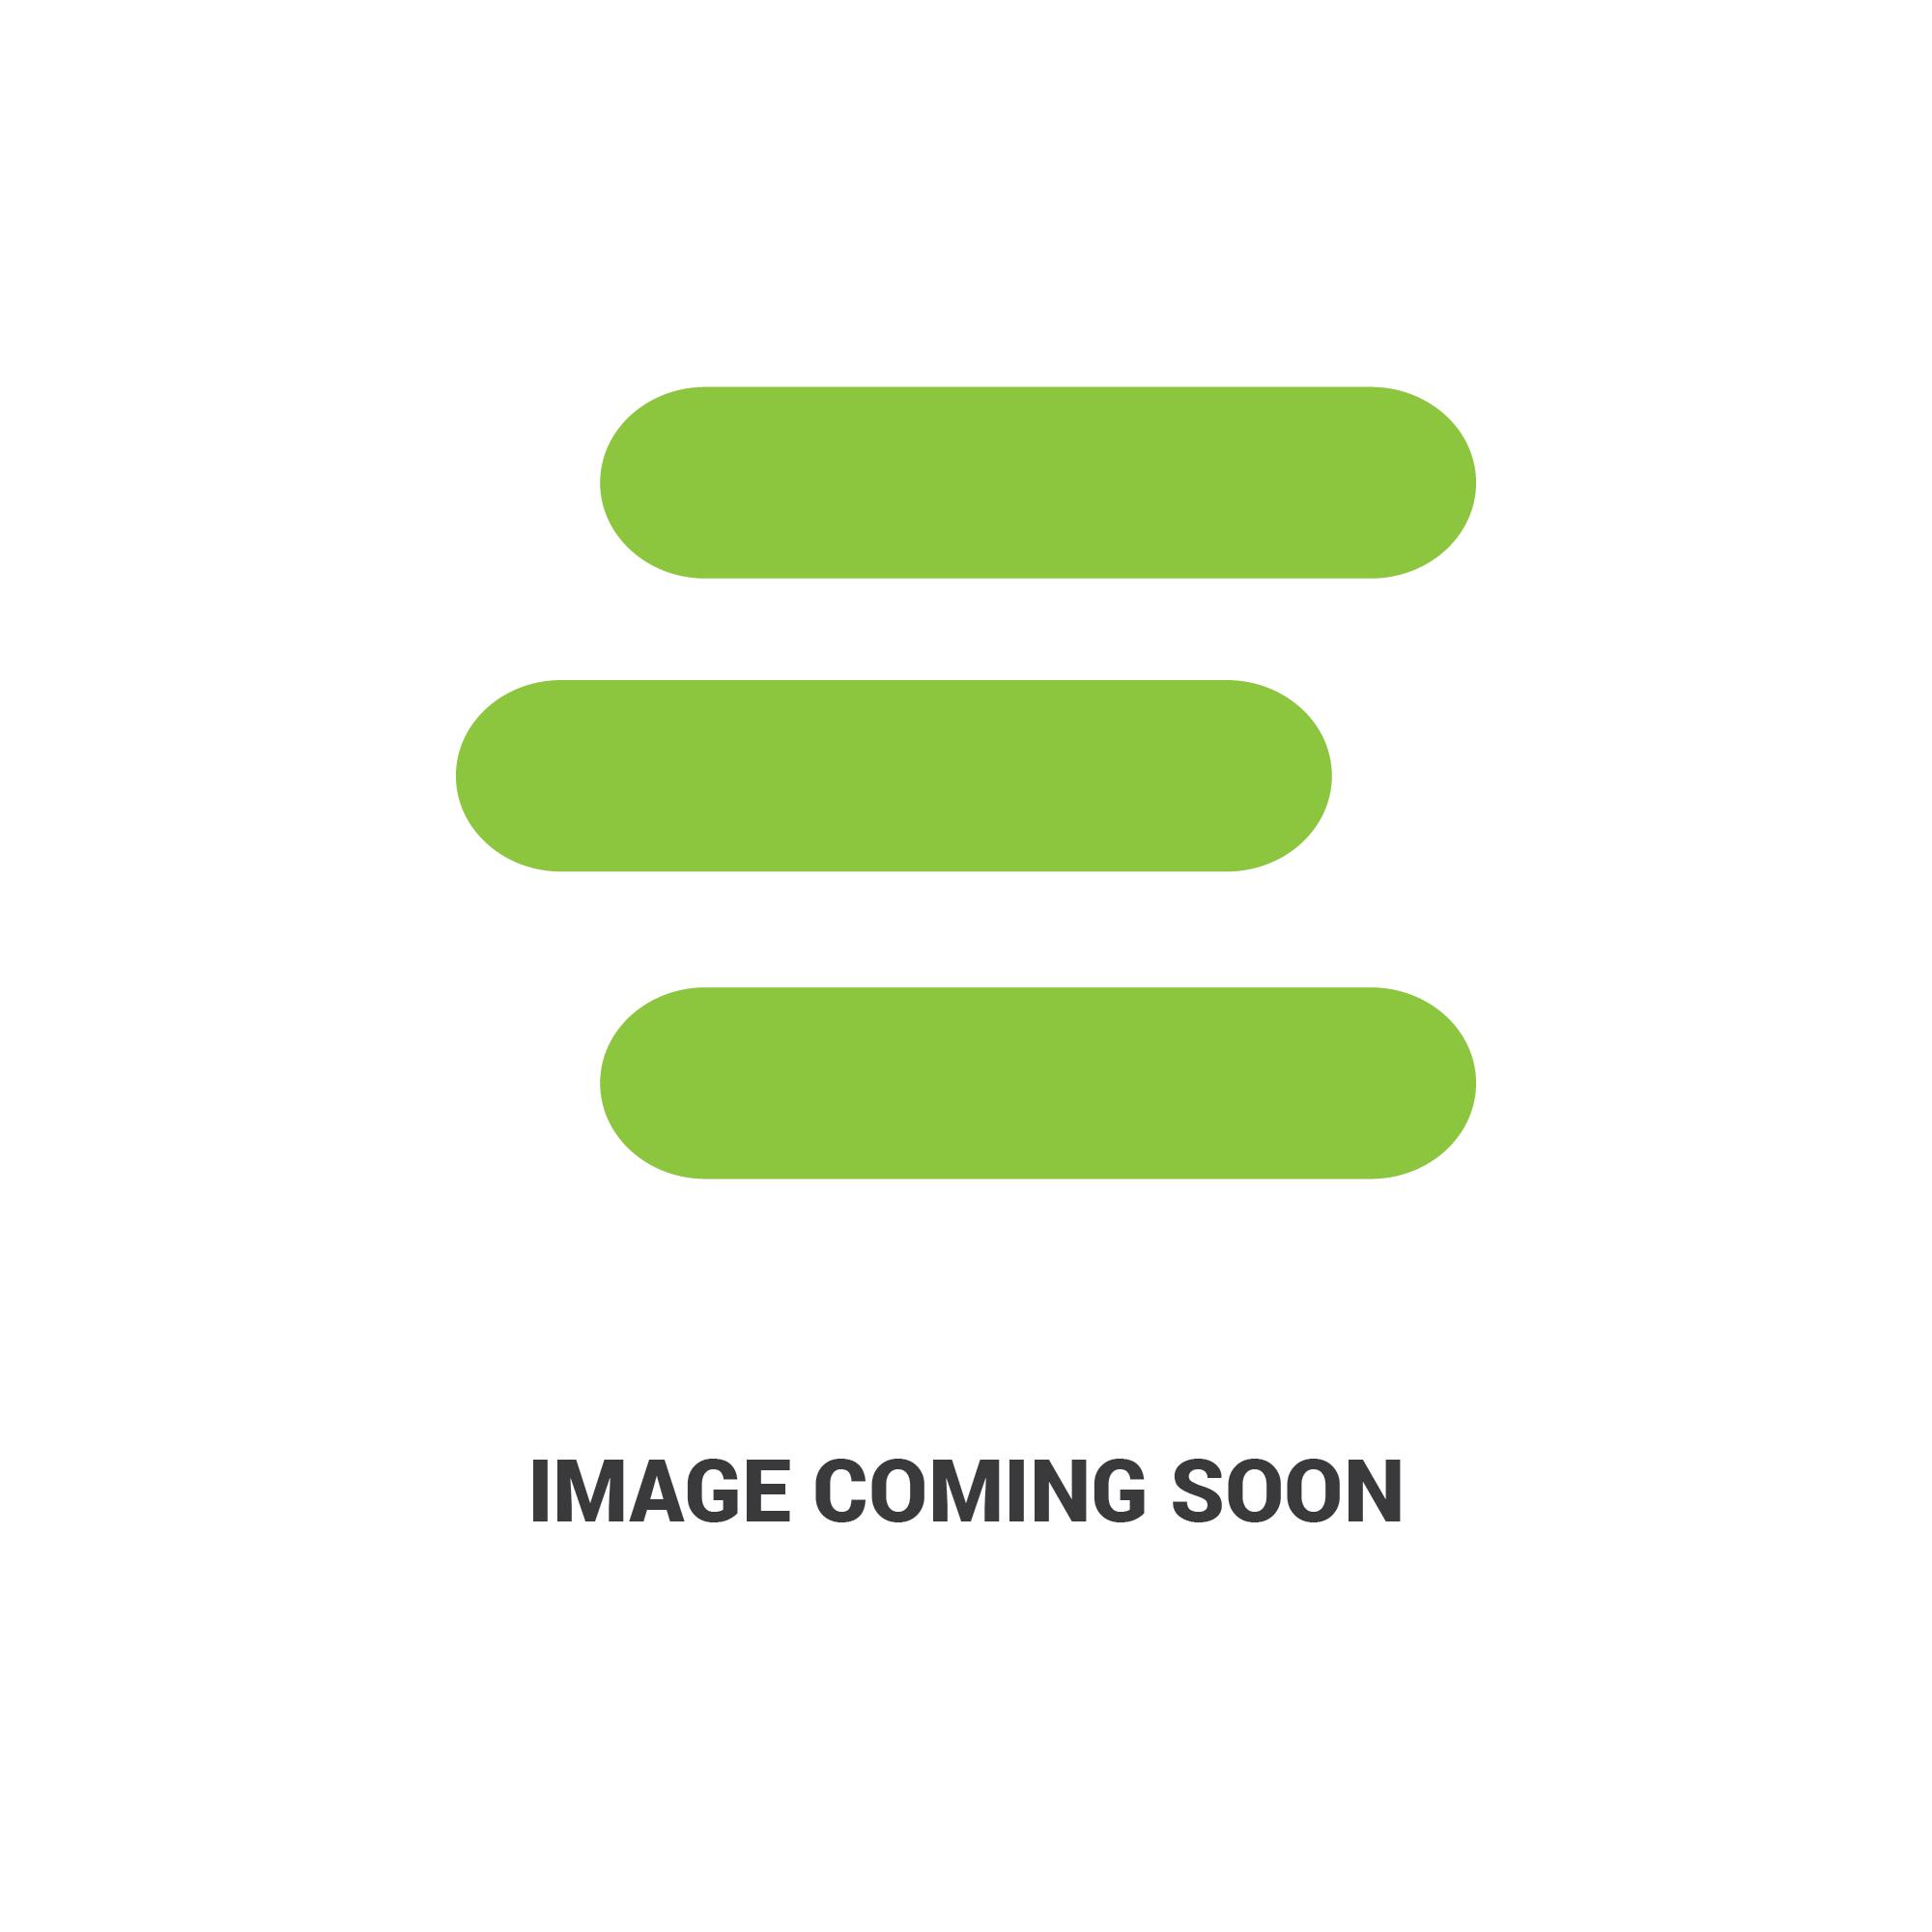 E-3C011-638801356_1.jpg